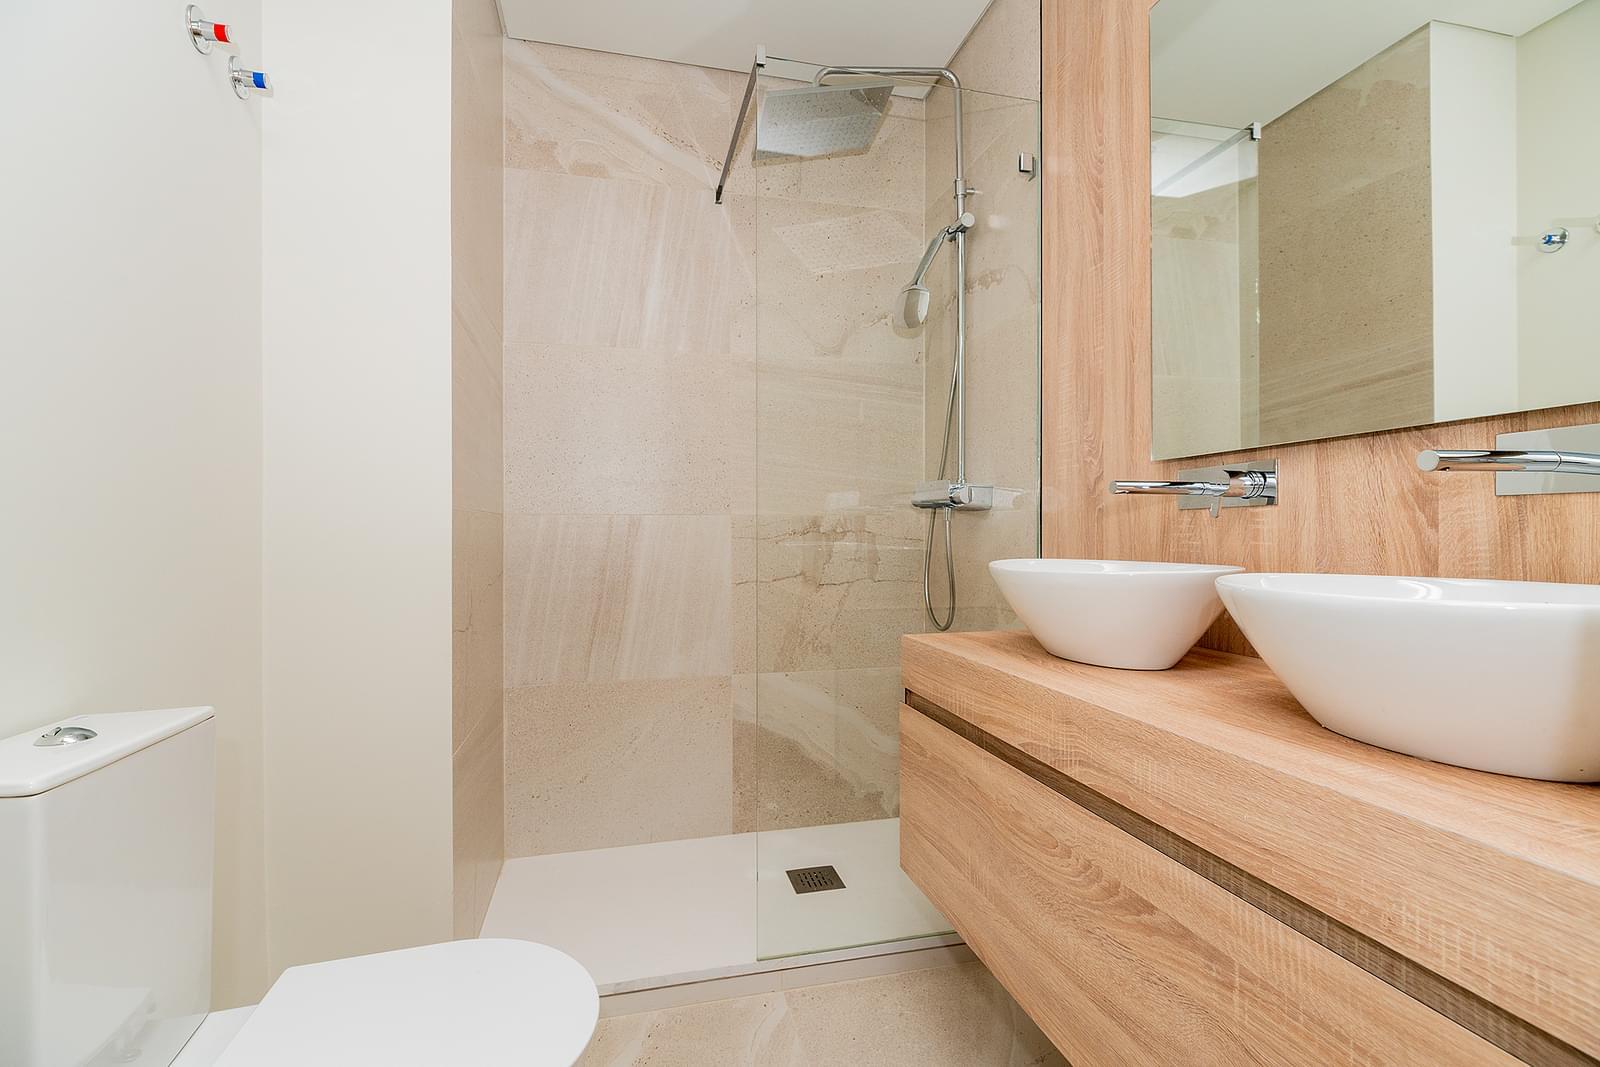 pf18308-apartamento-t2-lisboa-0dd13db8-0b1d-4154-84b8-6b237f08d99e